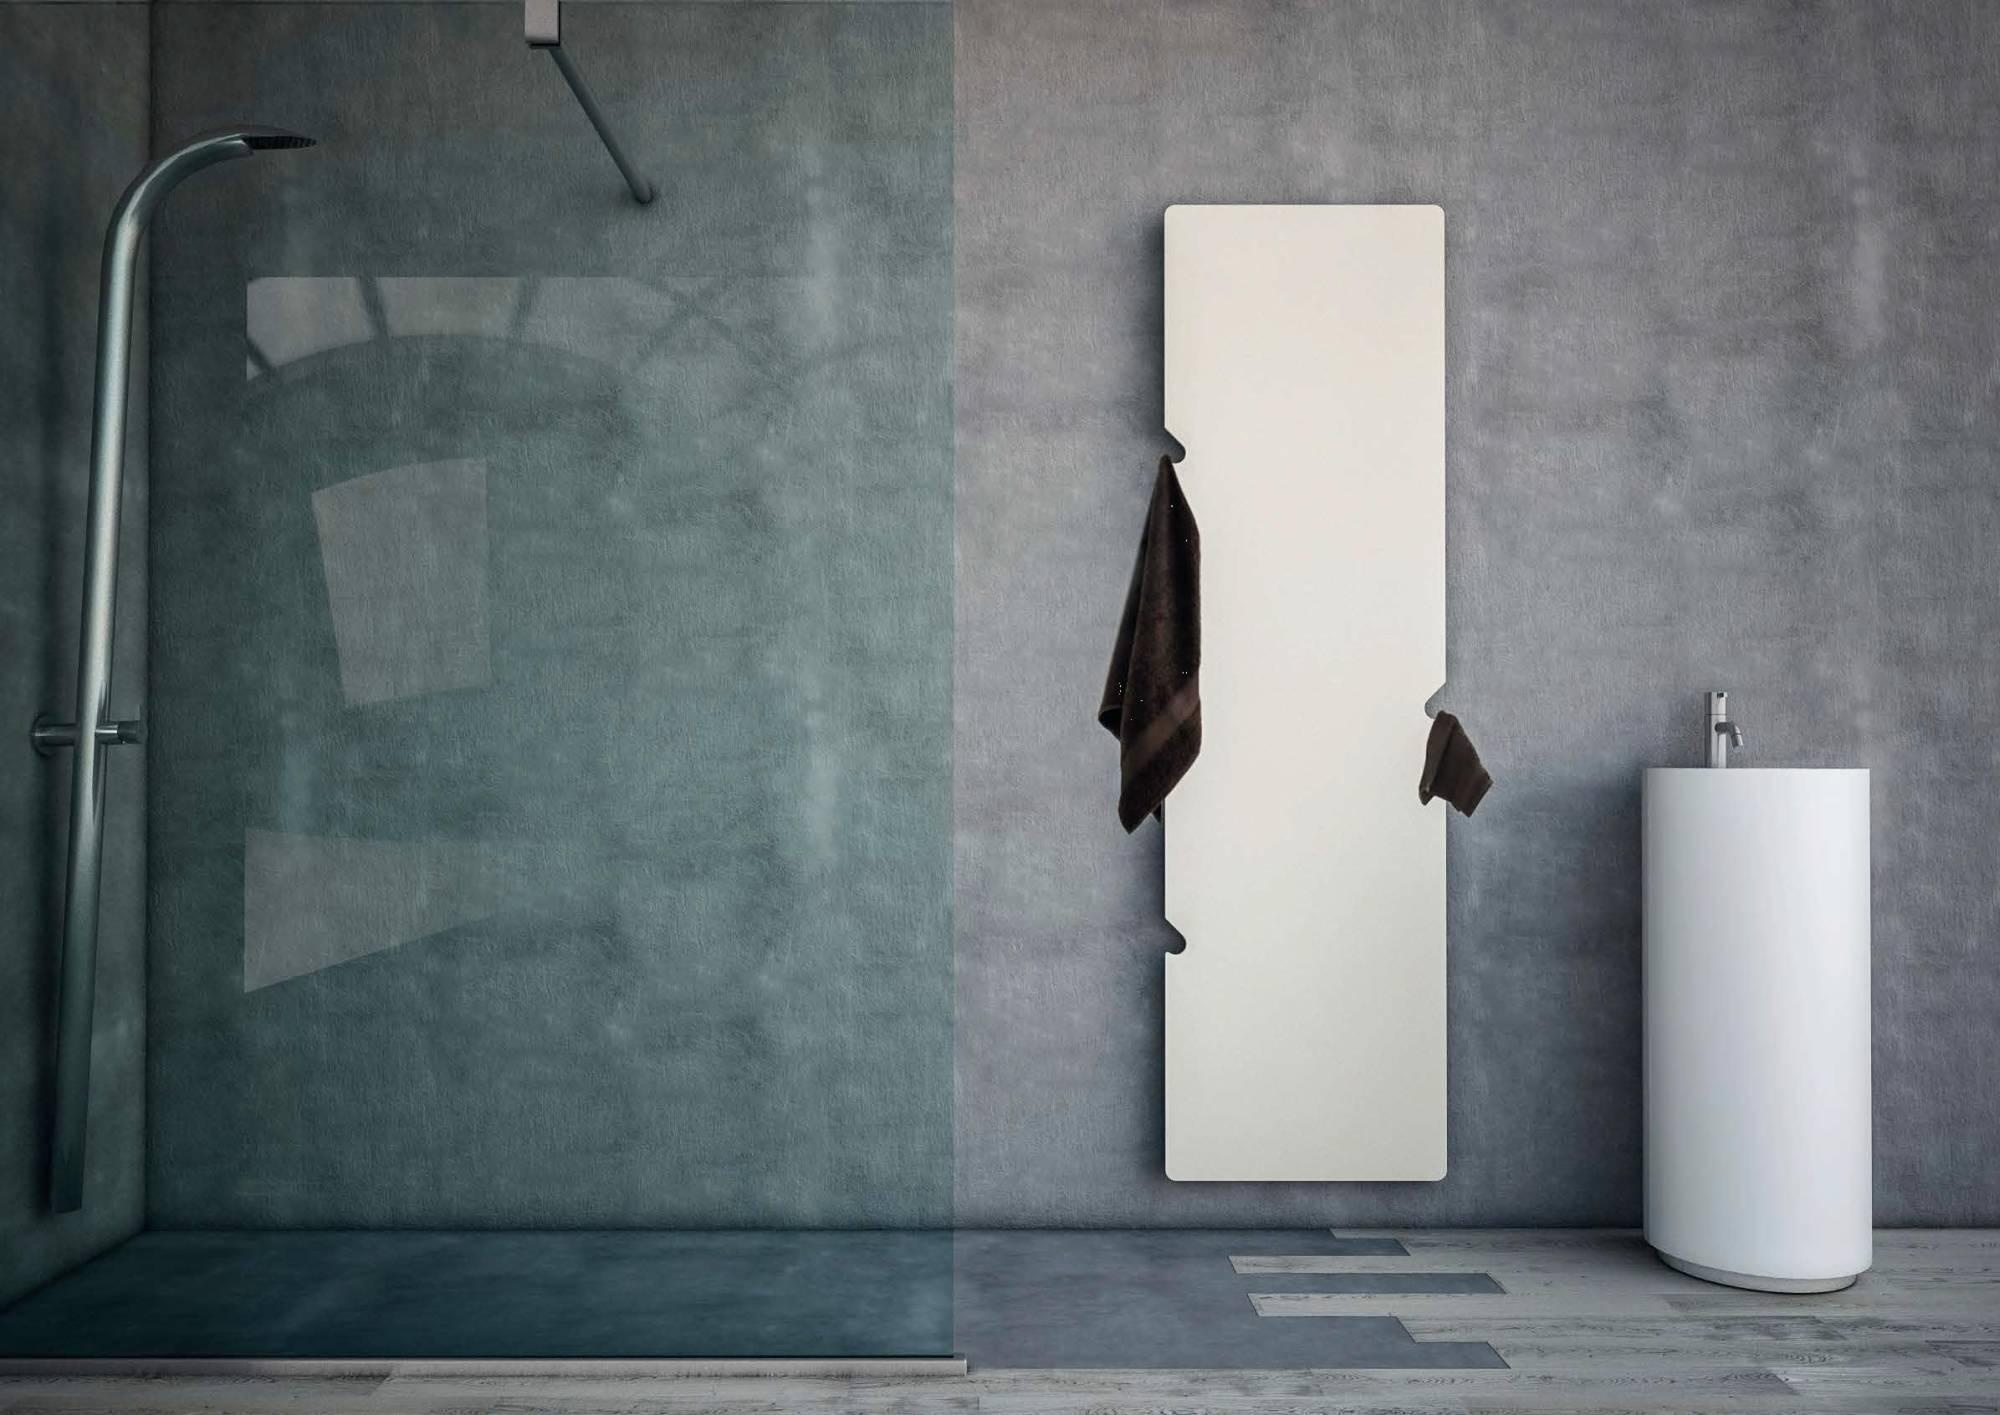 RADIATEUR Serviette chauffe salle de bain feel Graziano Design